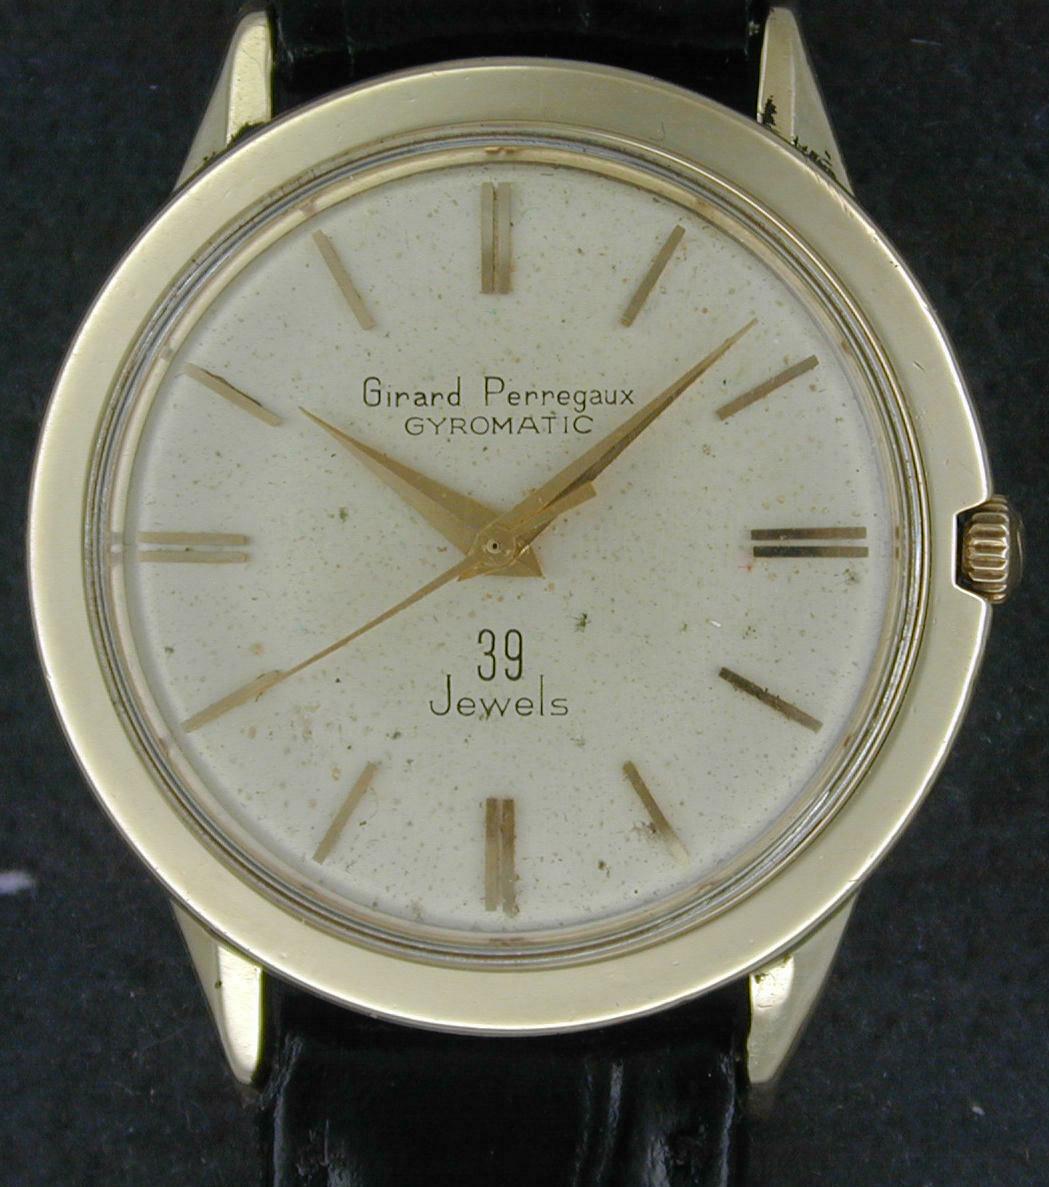 14kt Girard Perregaux Chronometre